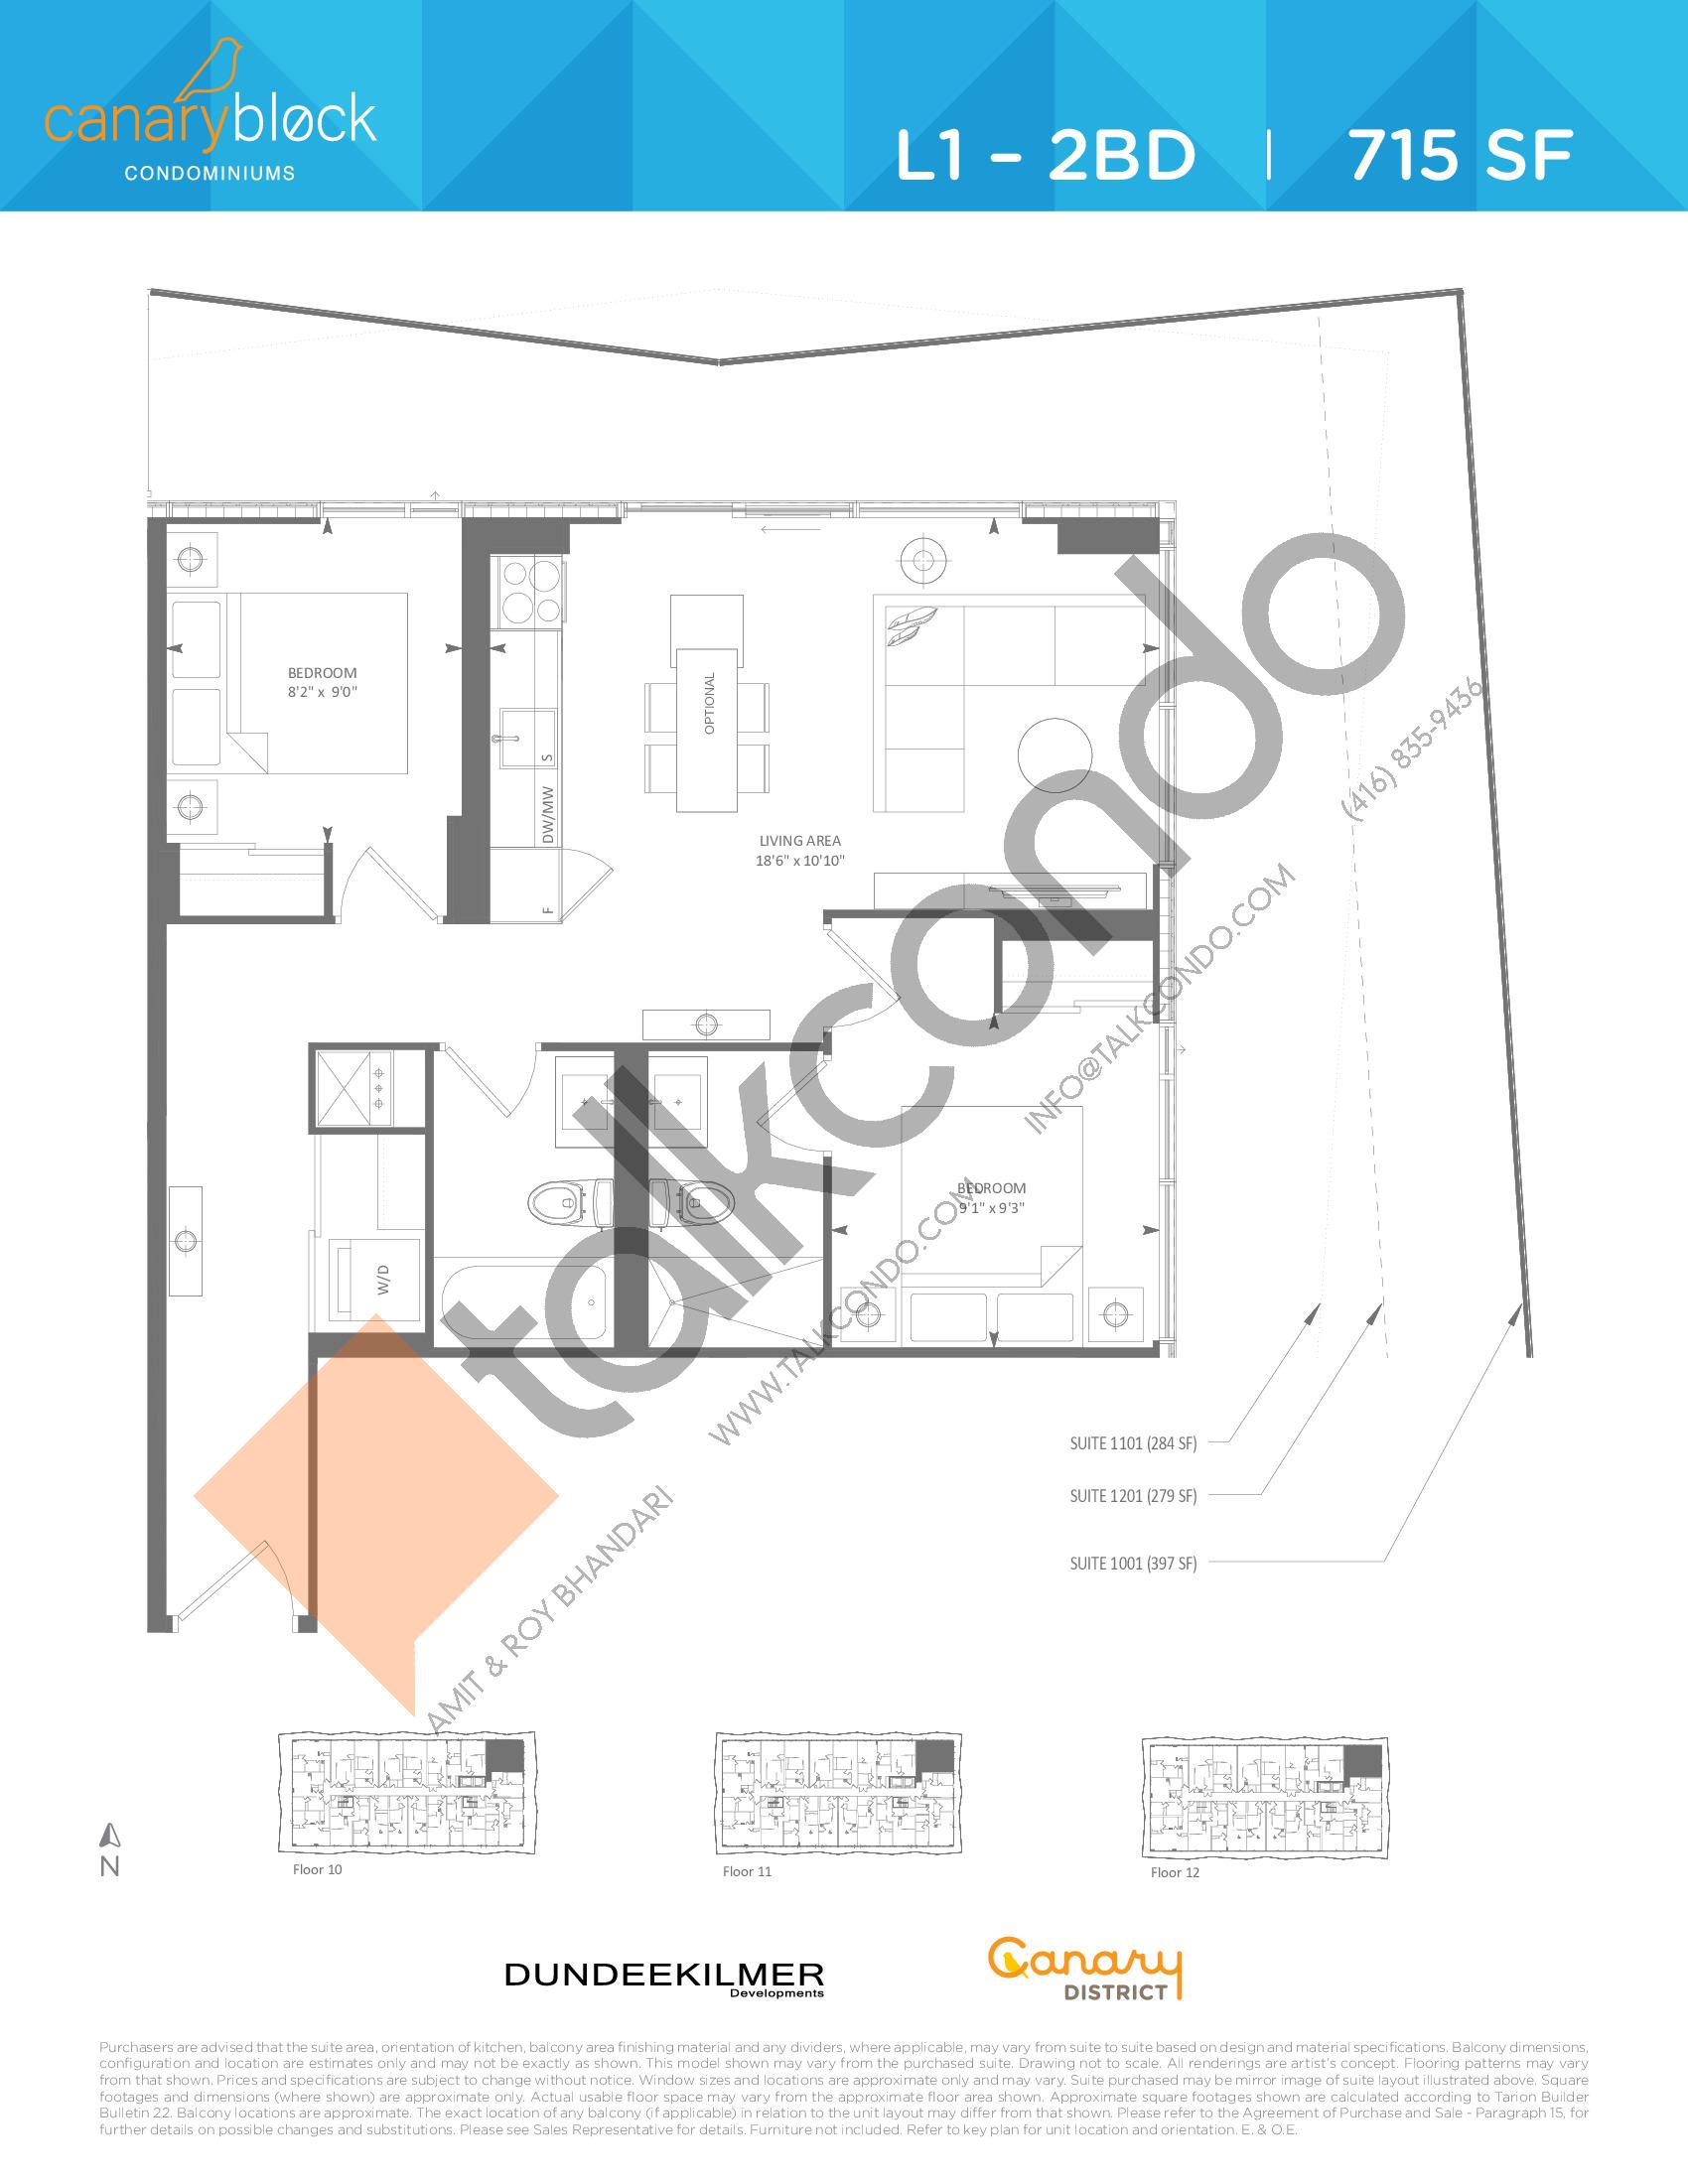 L1 - 2BD Floor Plan at Canary Block Condos - 715 sq.ft